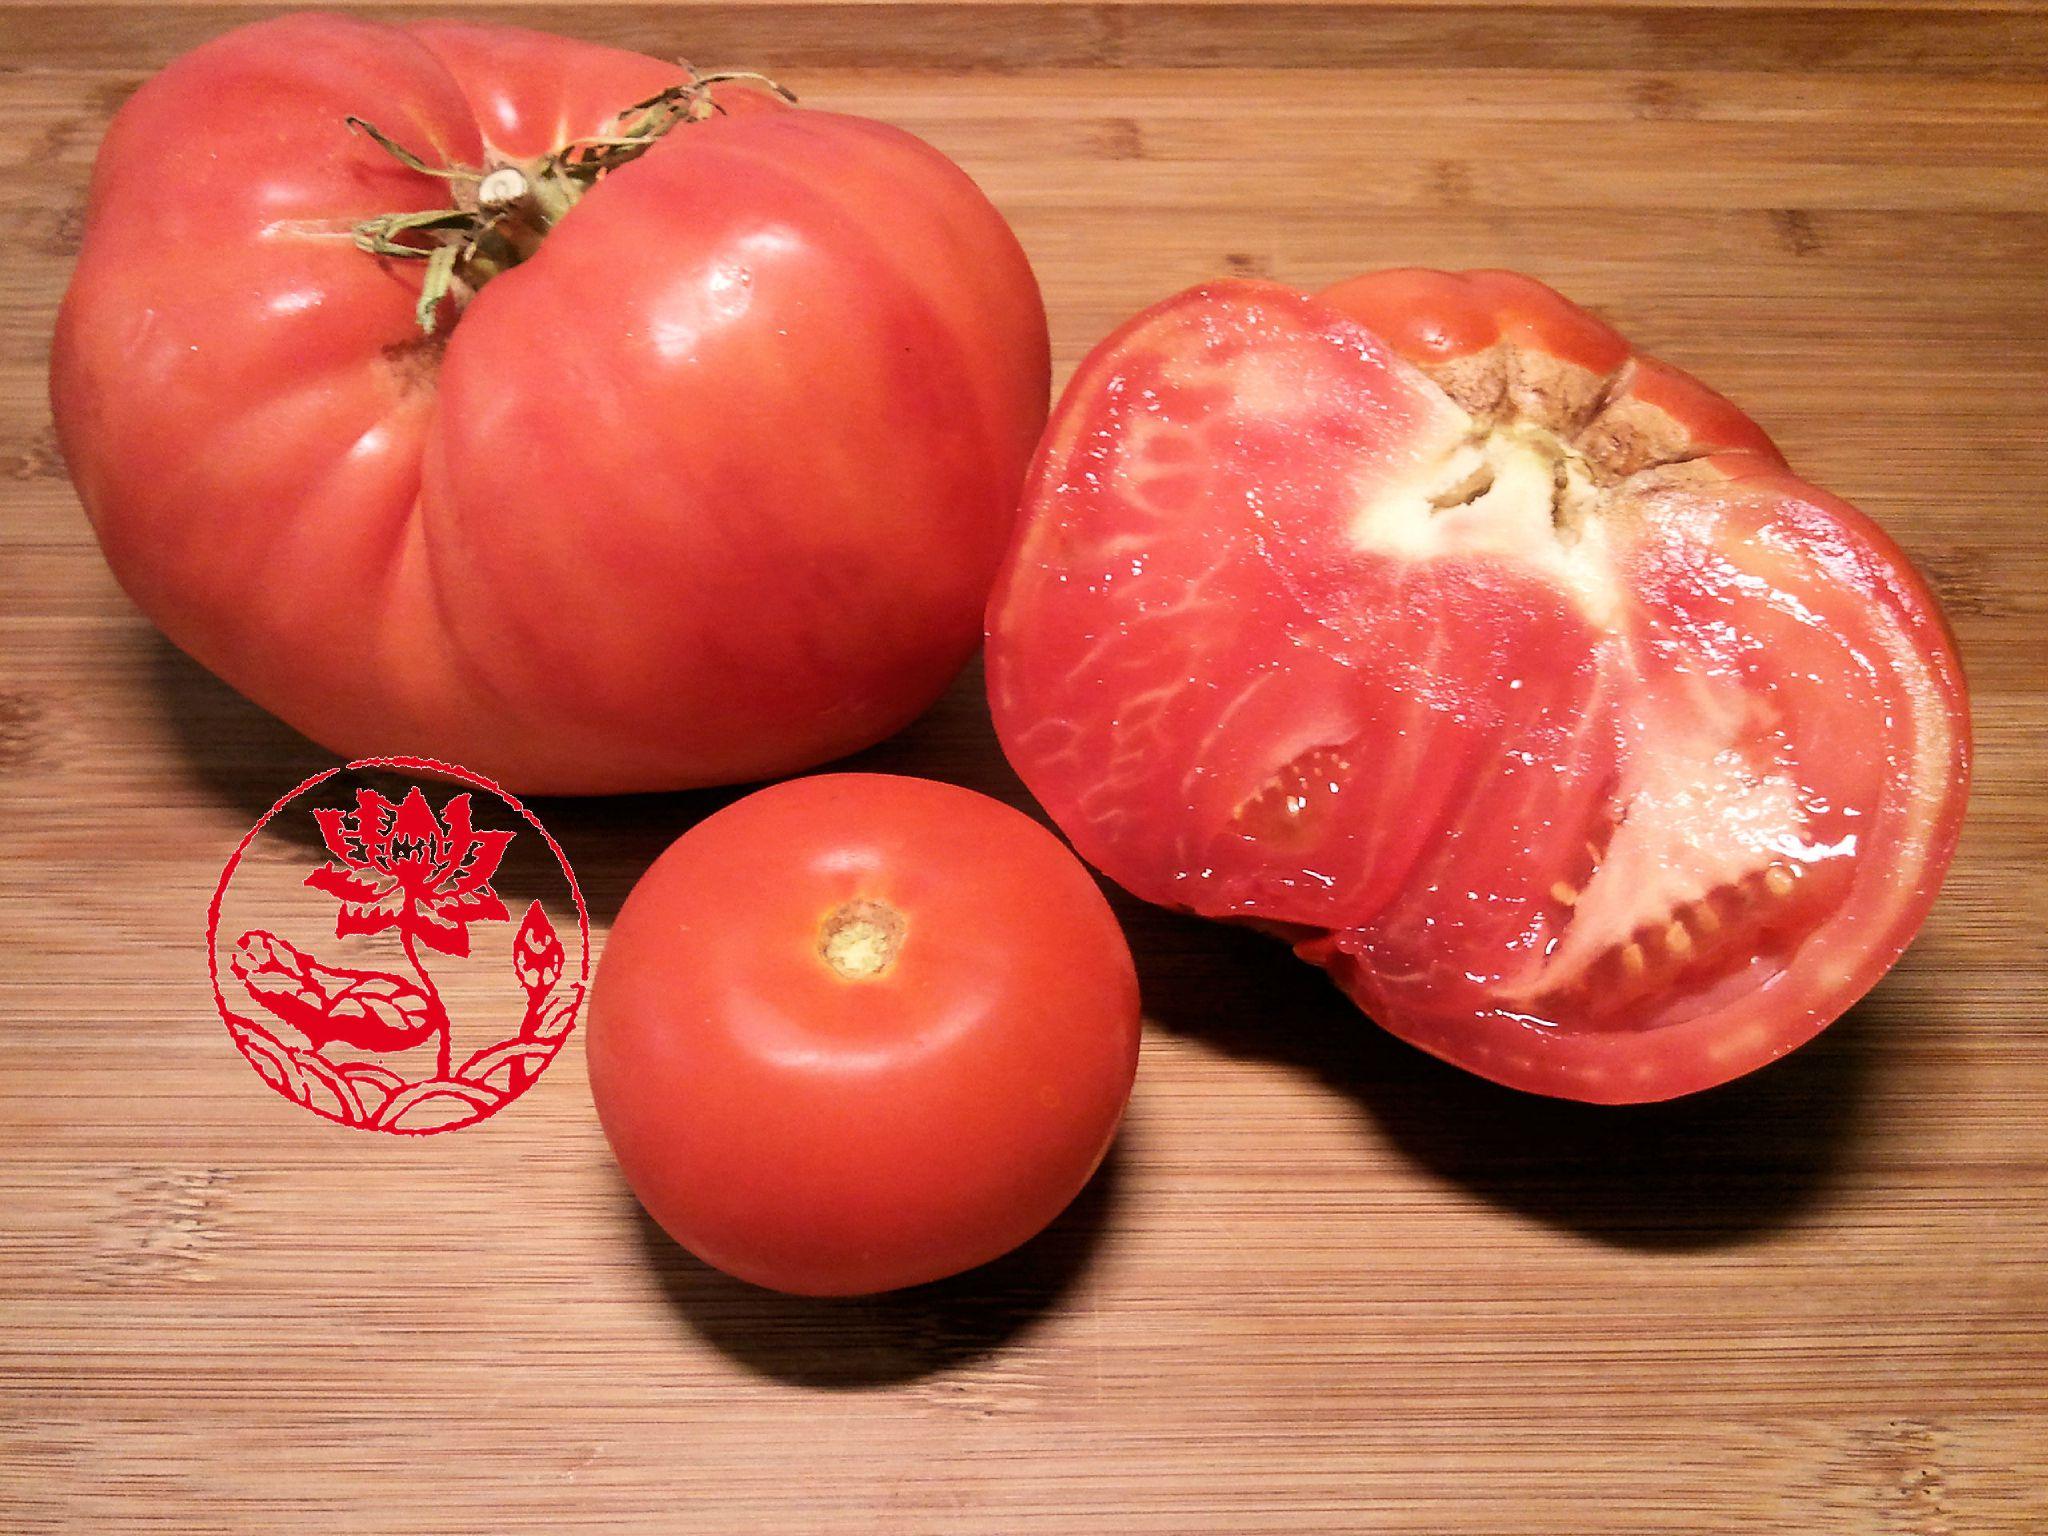 Tomates coeur de boeuf tomates farcies rizi re des parfums - Planter des tomates coeur de boeuf ...